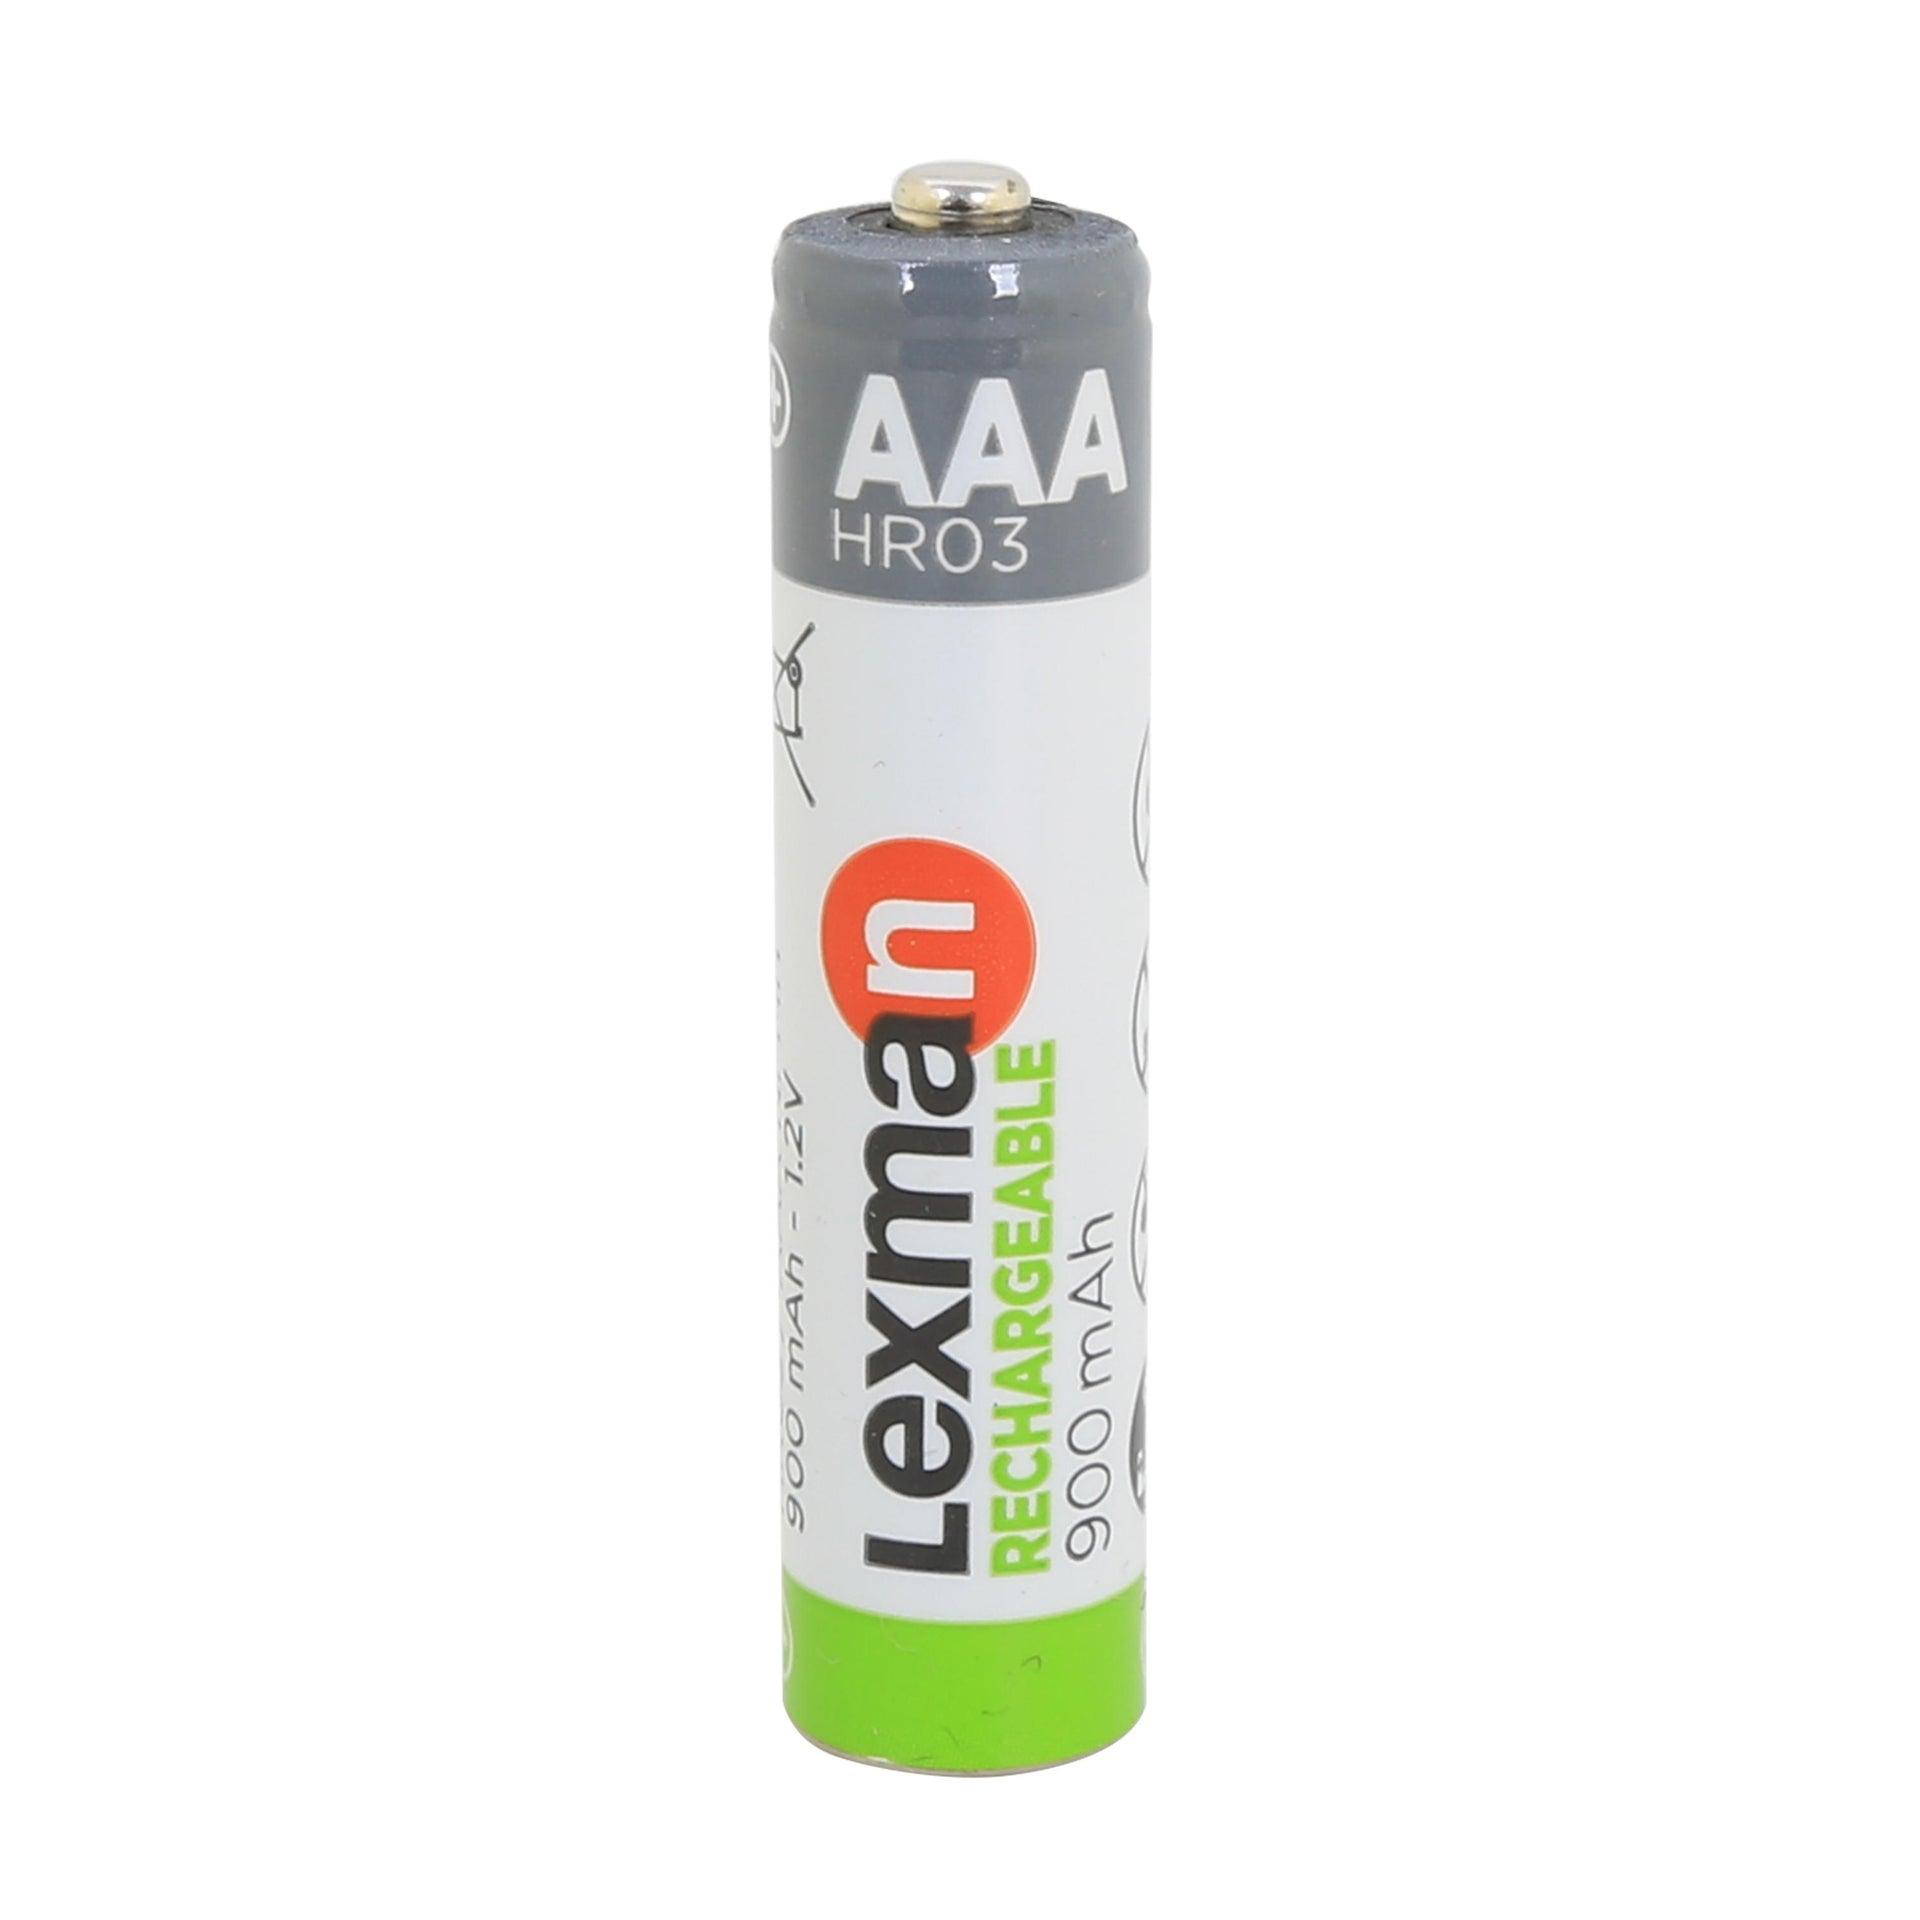 Pila ricaricabile HR6 LEXMAN 844976 4 batterie - 6